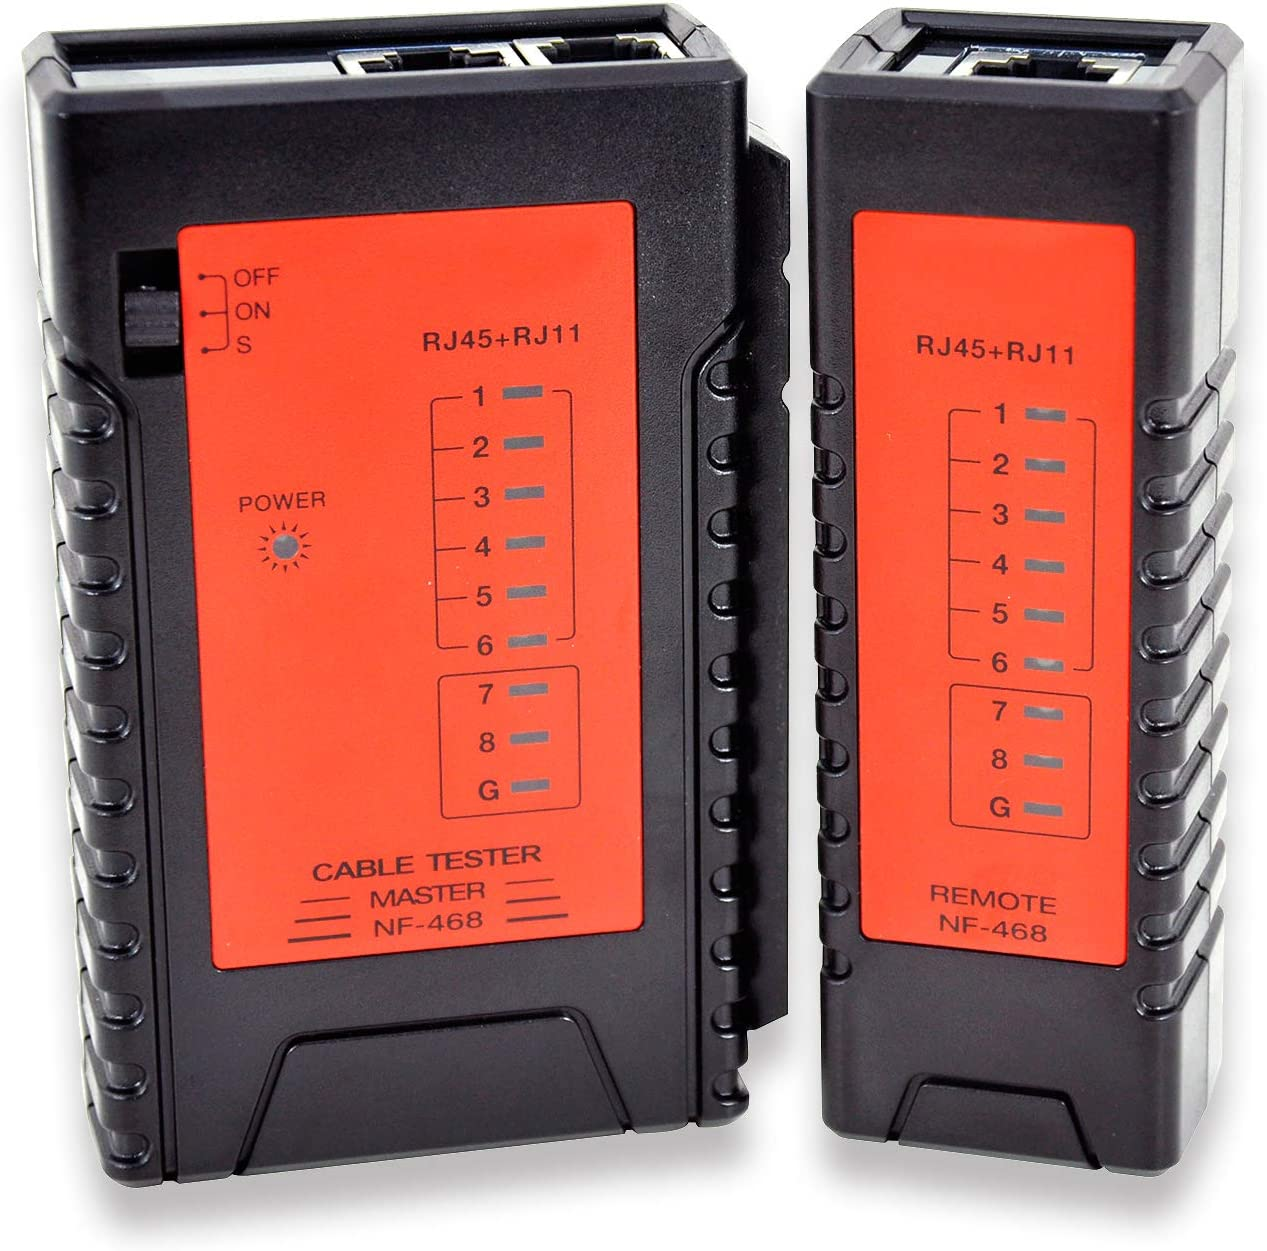 Cat-6 Tester per cavi di rete LAN RJ11 e RJ45 KOLSOL NF-468 Cat-5